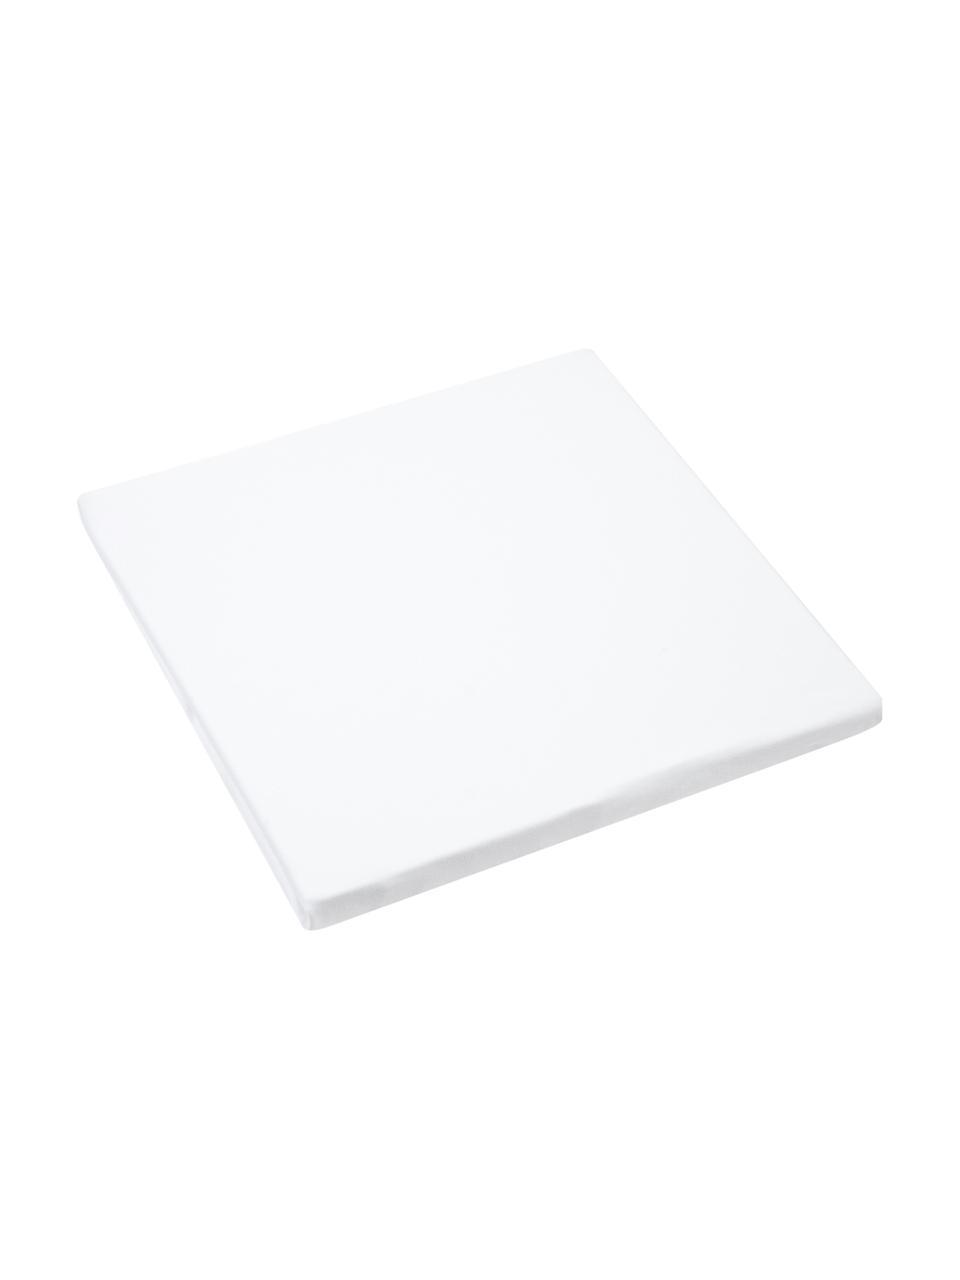 Lenzuolo con angoli in jersey-elastan Lara, 95% cotone, 5% spandex, Bianco, Larg. 180 x Lung. 200 cm